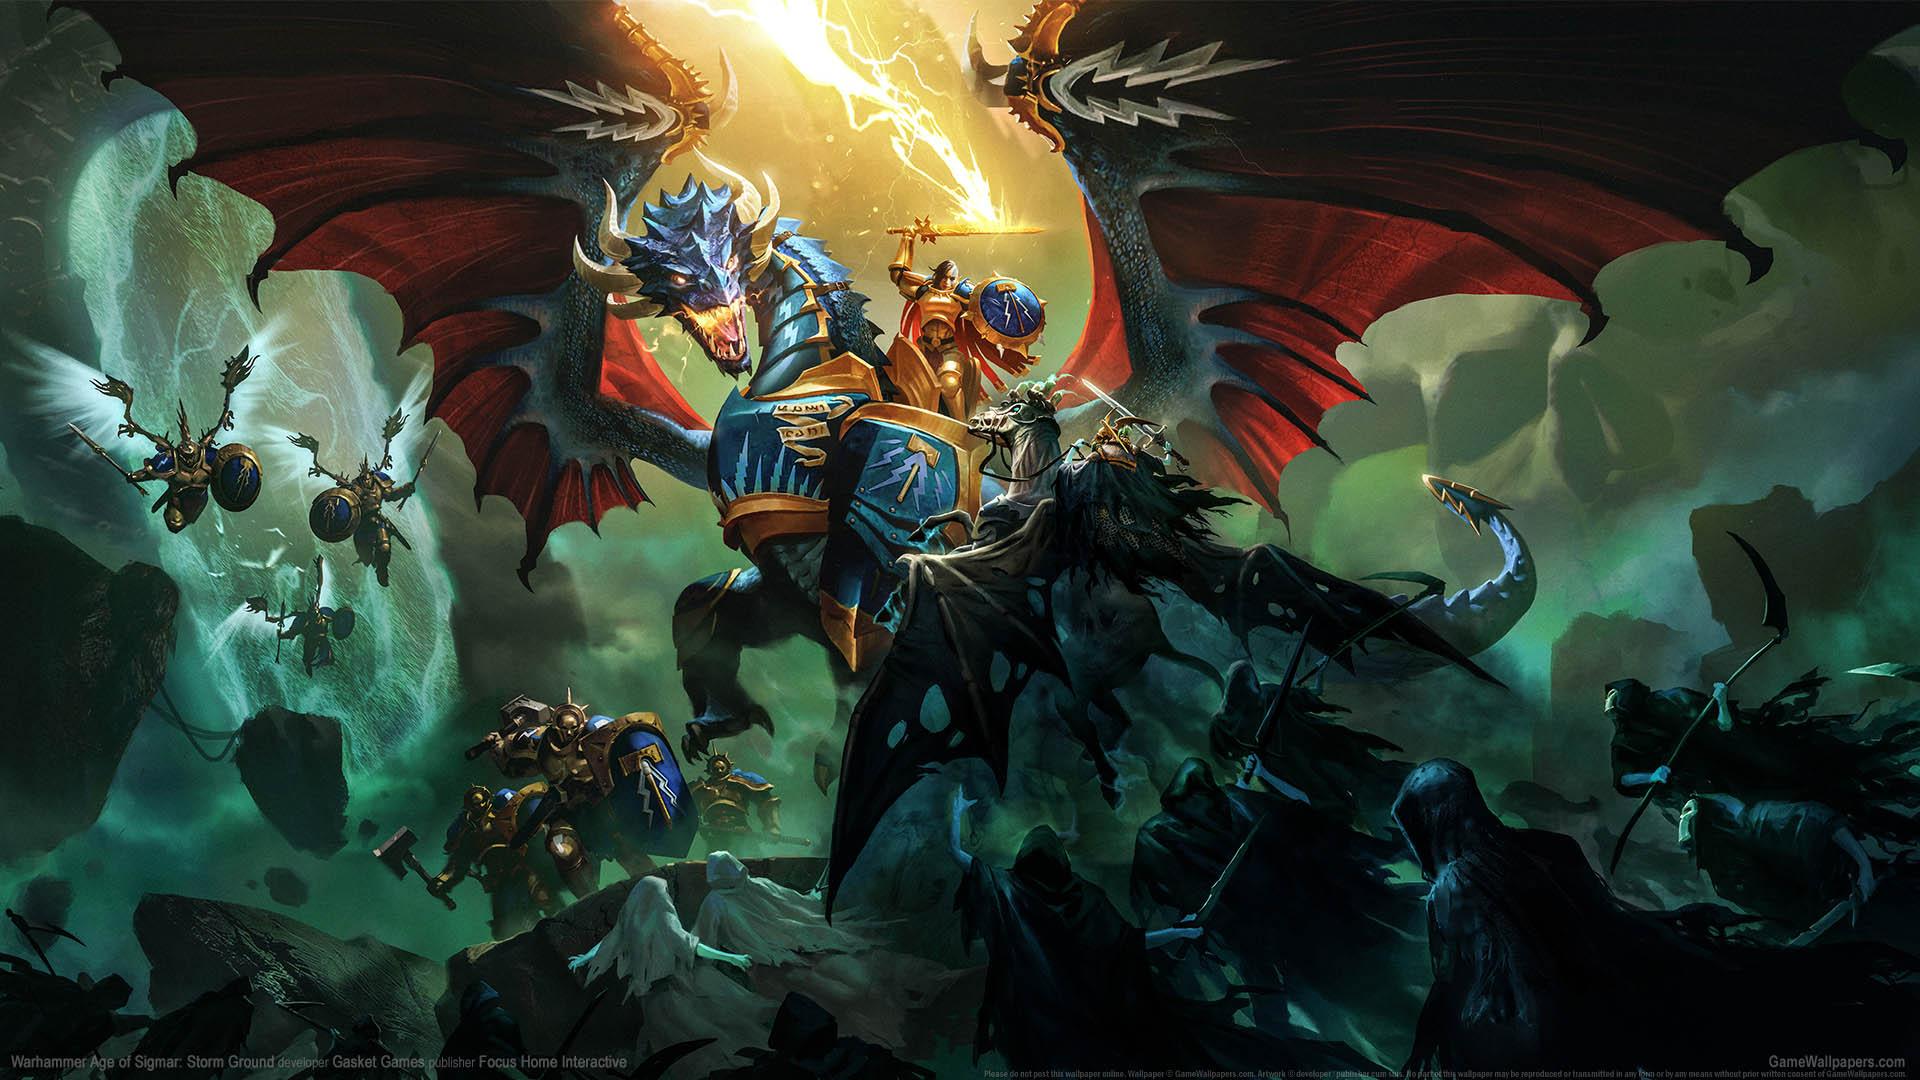 Warhammer Age of Sigmar: Storm Ground wallpaper 01 1920x1080